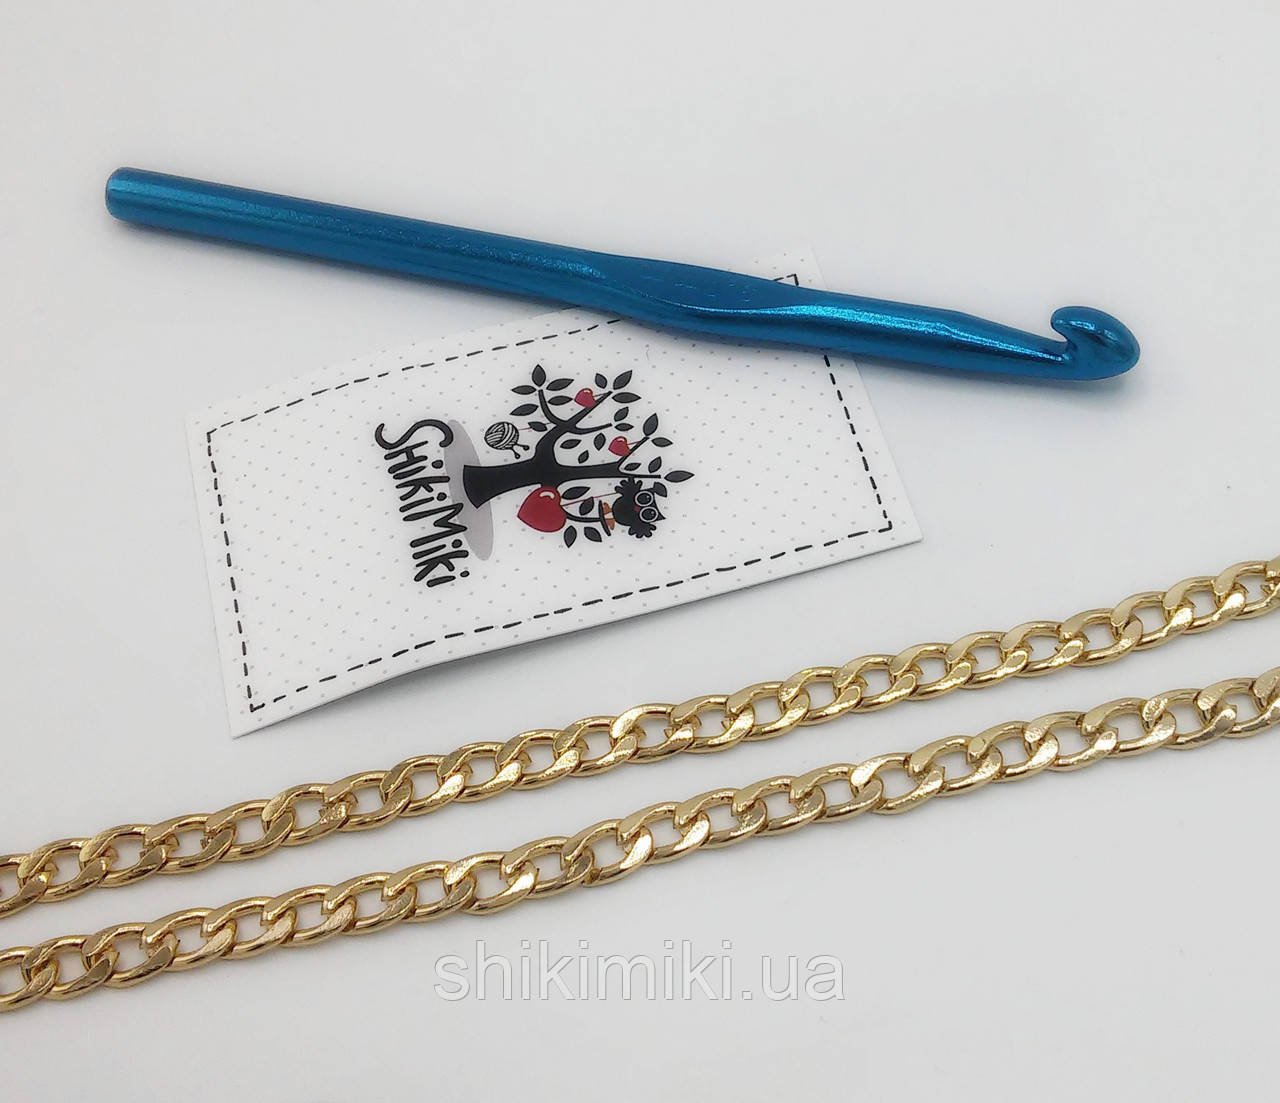 Цепочка для сумки мелкая Z23-3, цвет золото